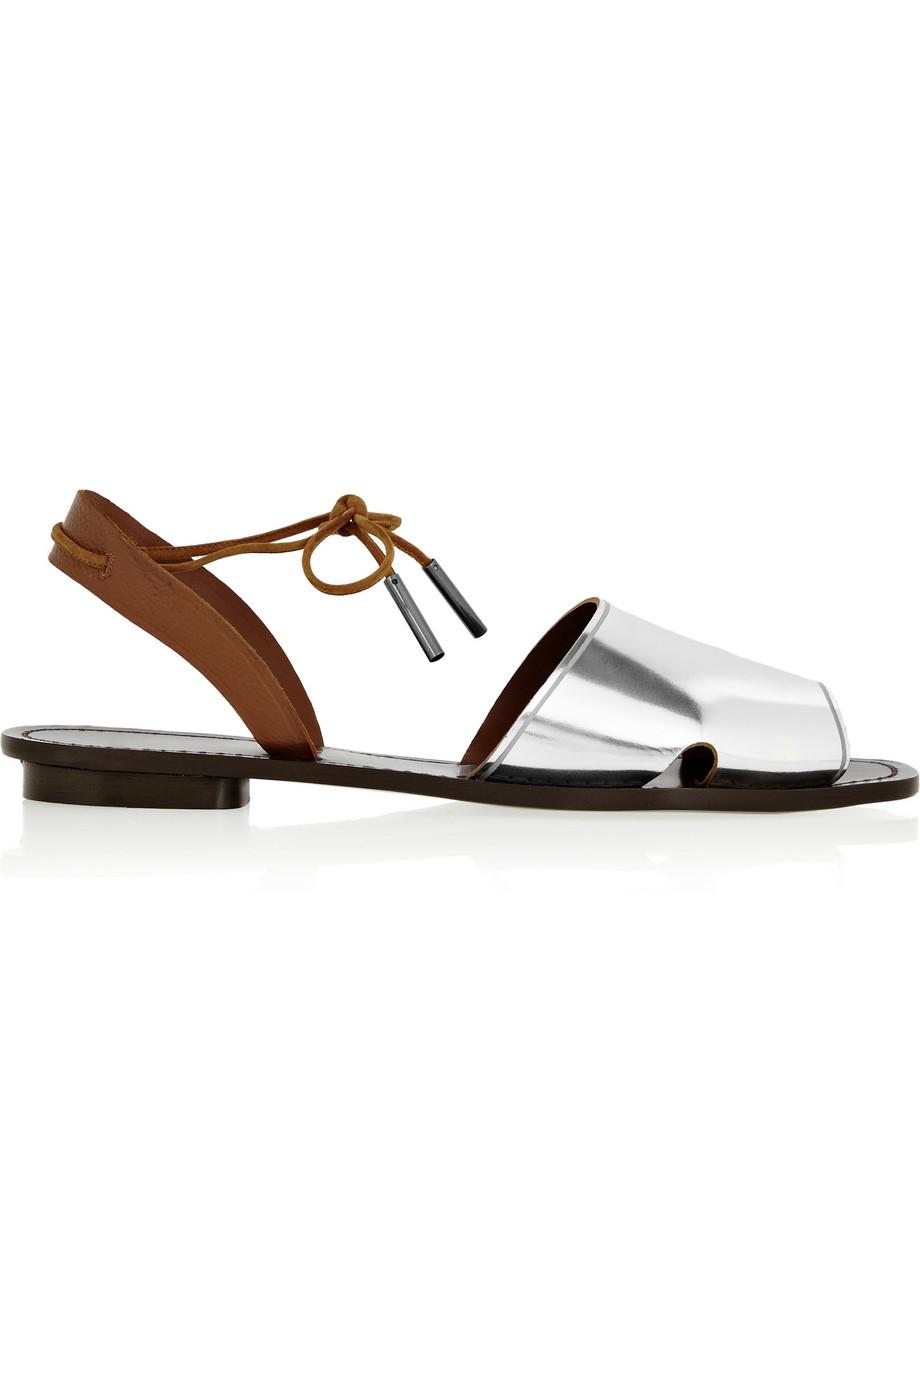 Maiyet Desert metallic leather sandals